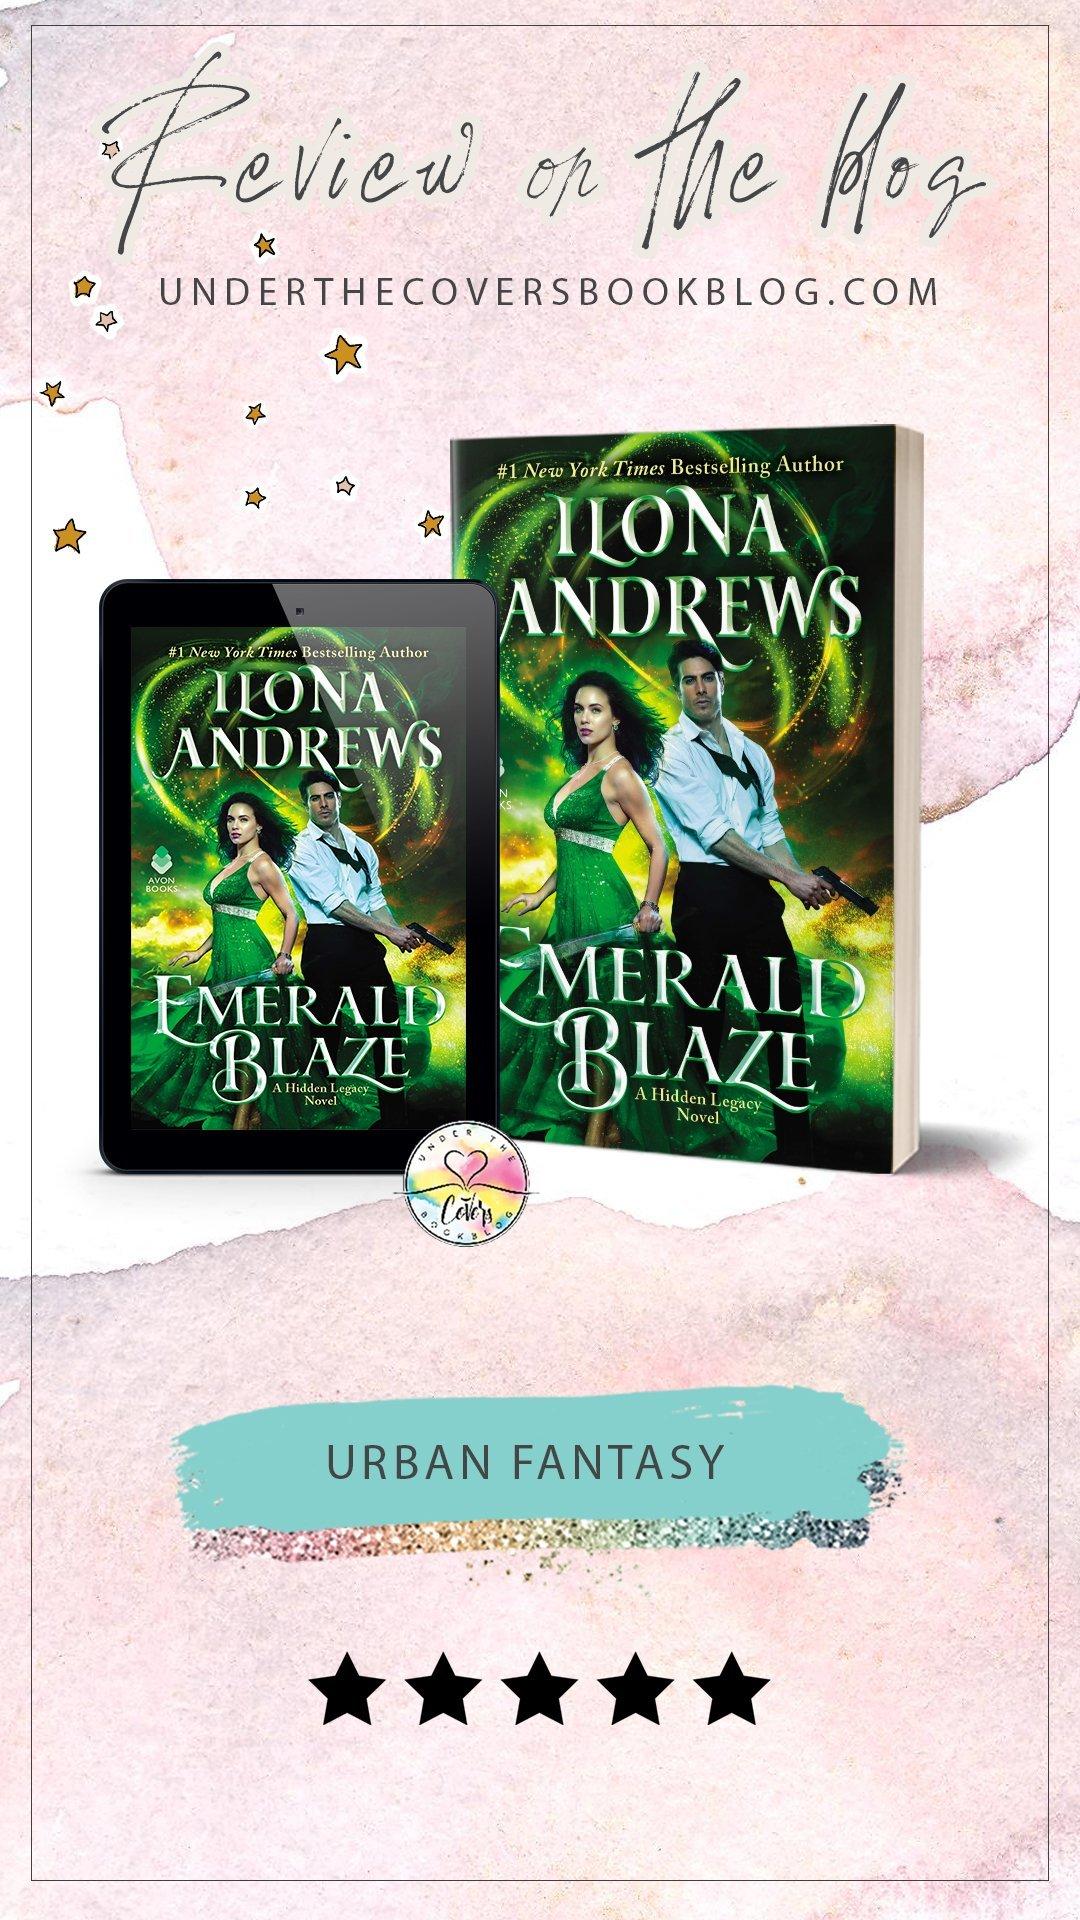 ARC Review: Emerald Blaze by Ilona Andrews